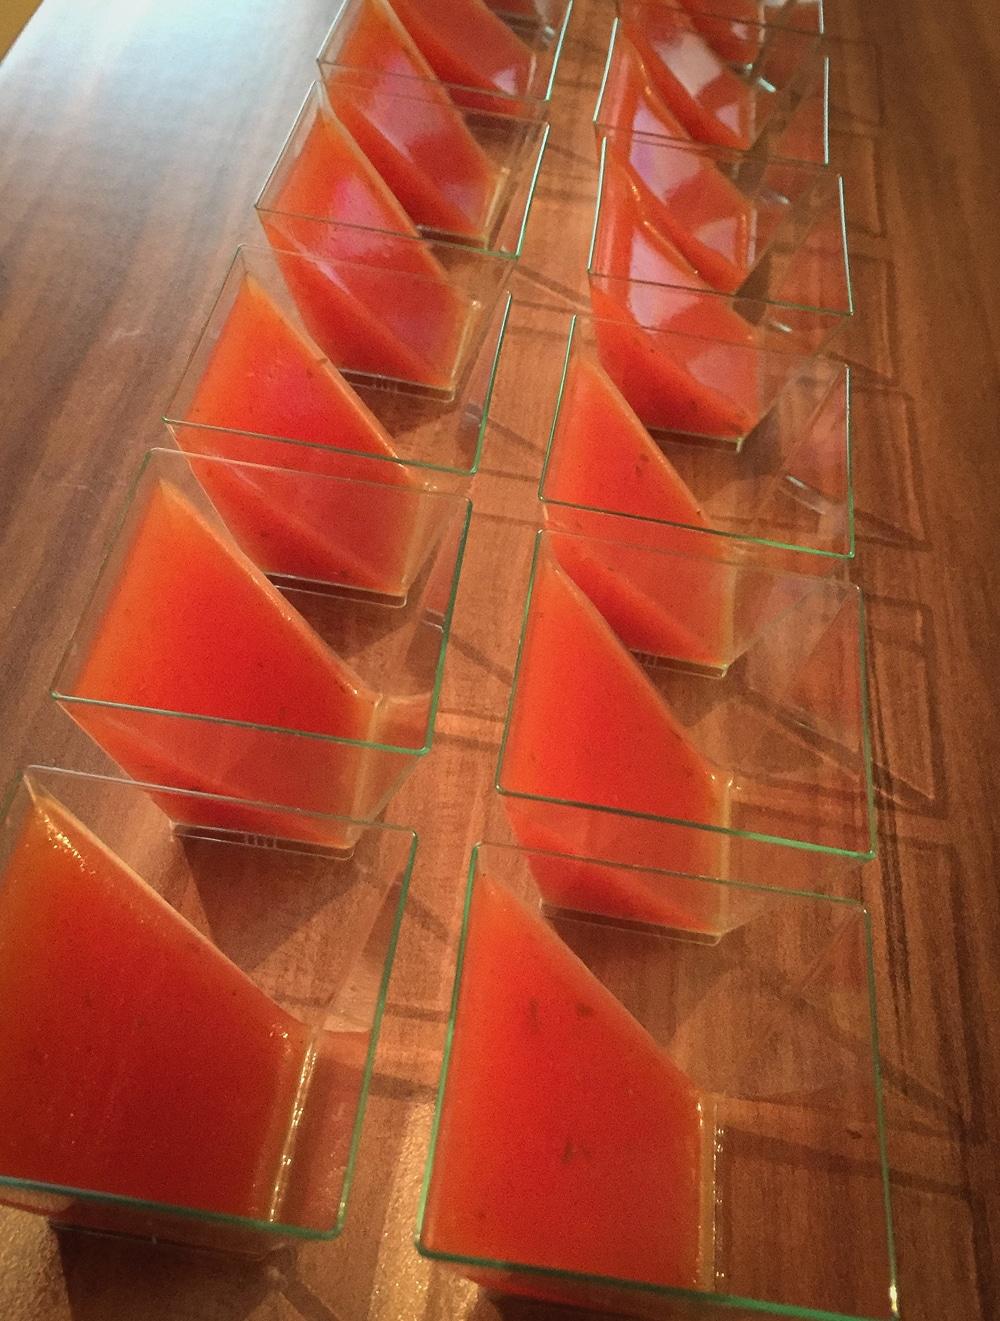 Paradeiserpudding mit Avocados - Tomatenpudding4 - 8